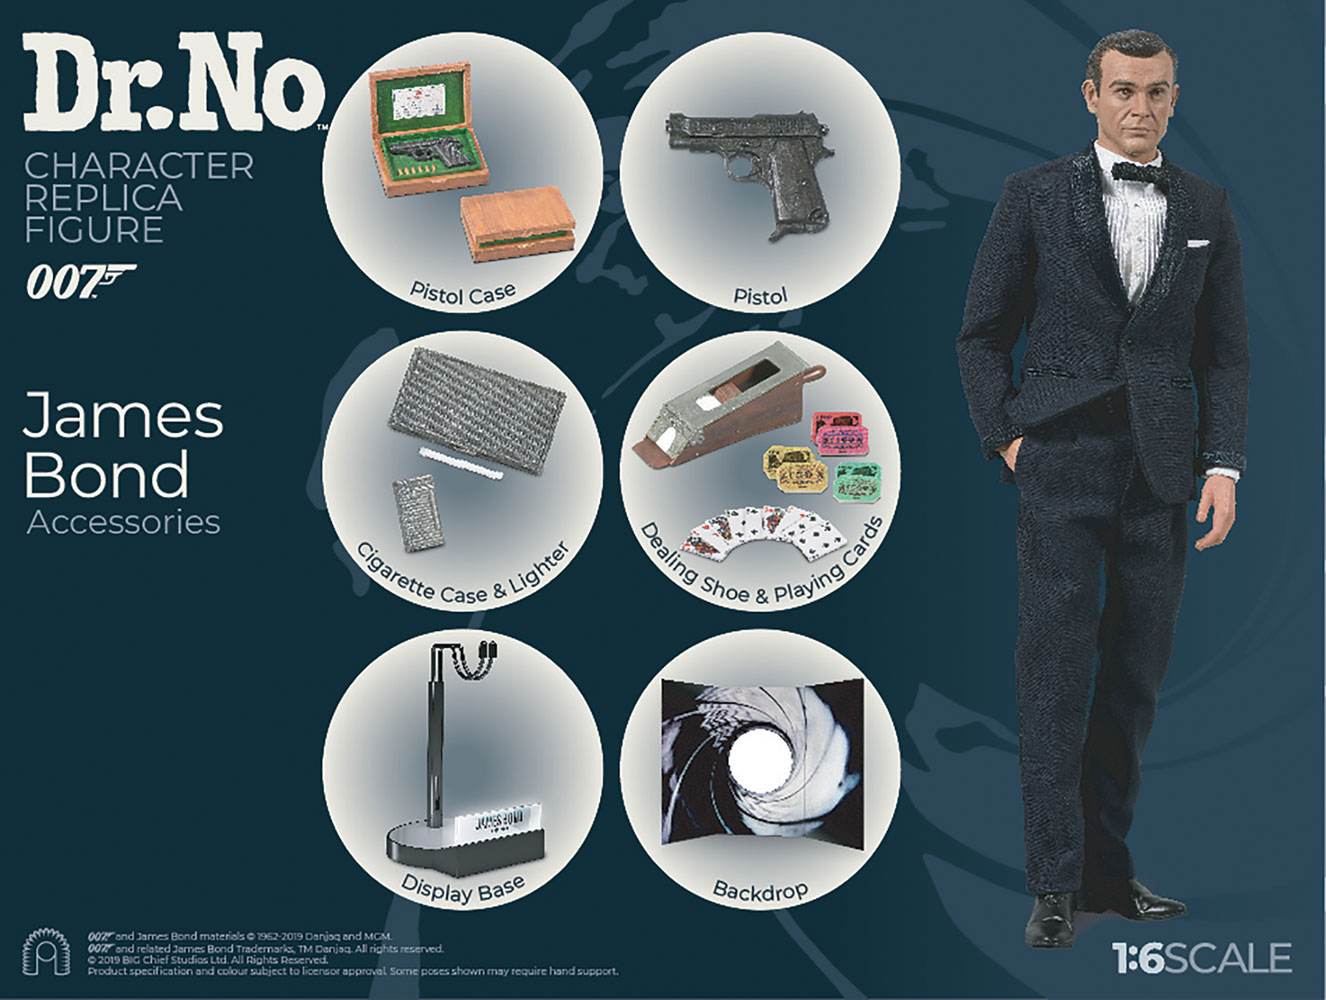 James Bond Limited Collector Figure: Dr. No James Bond  (1/6 Scale) - Big Chief Studios